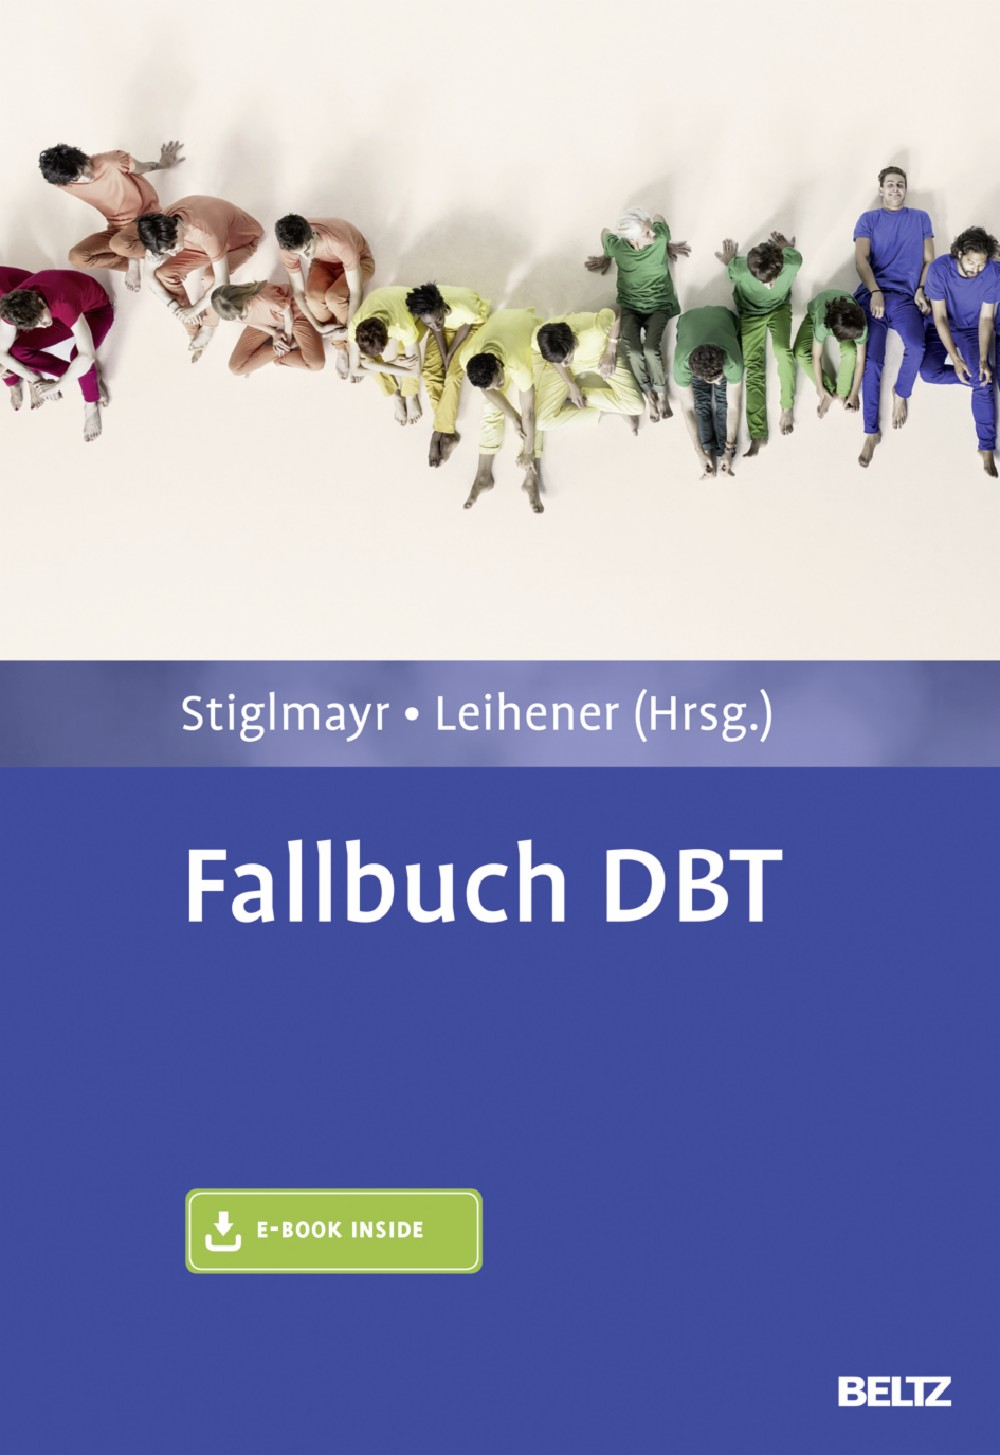 Fallbuch DBT - Mit E-Book inside und Arbeitsmaterial - Christian ...